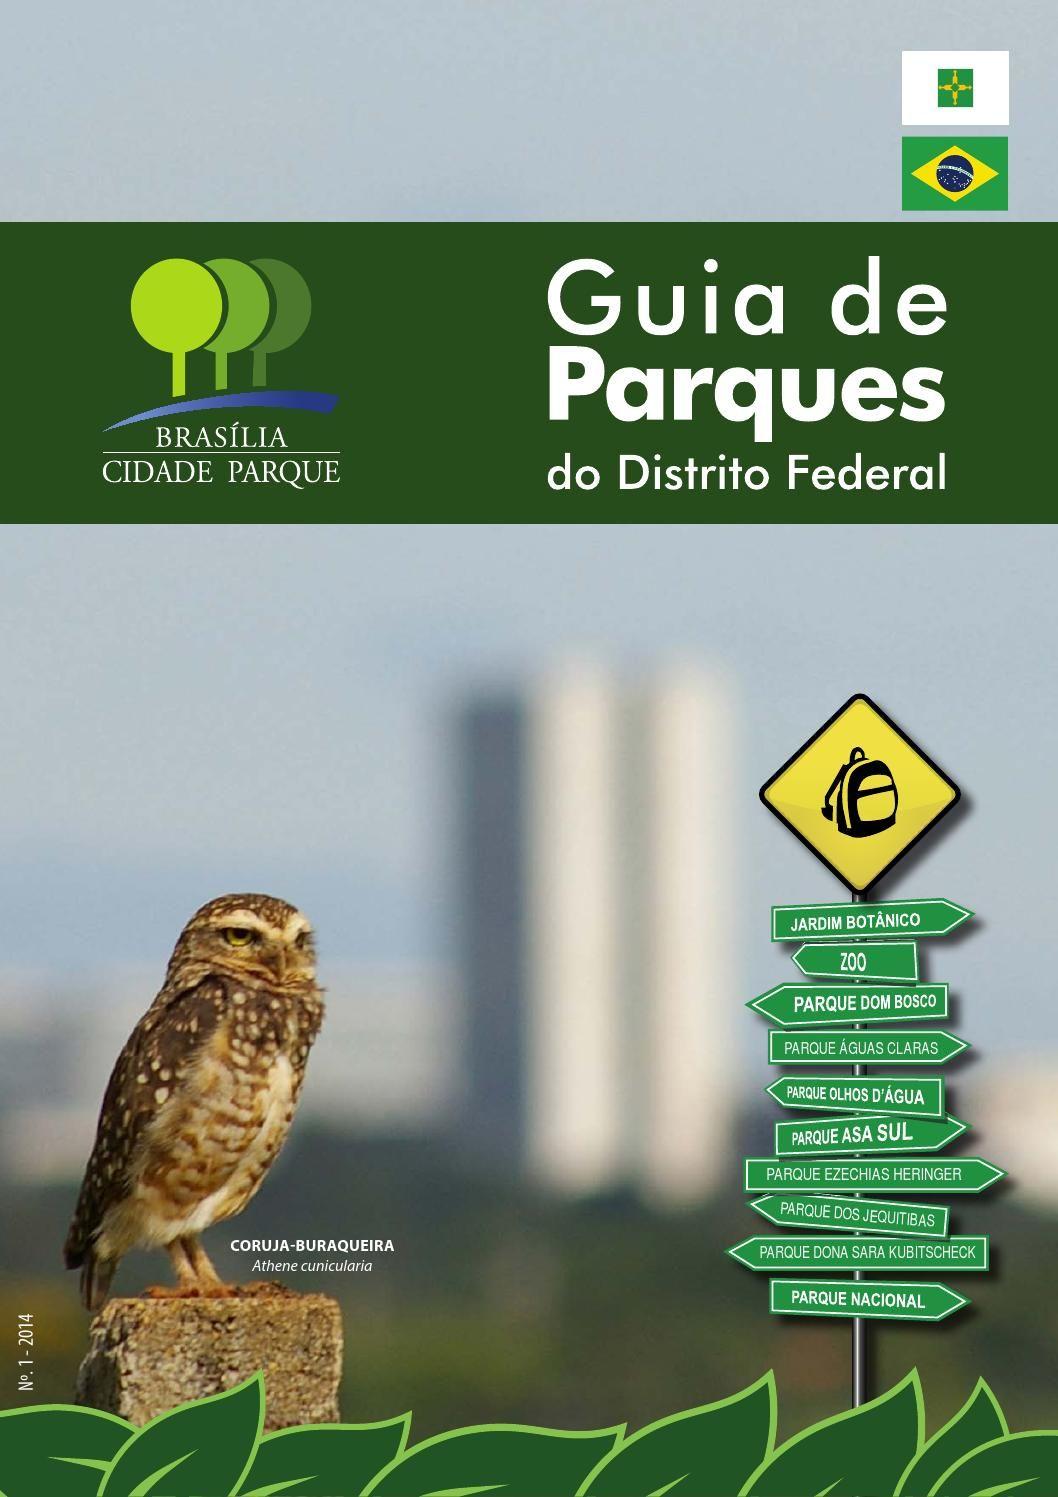 Guia dos Parques do Distrito Federal